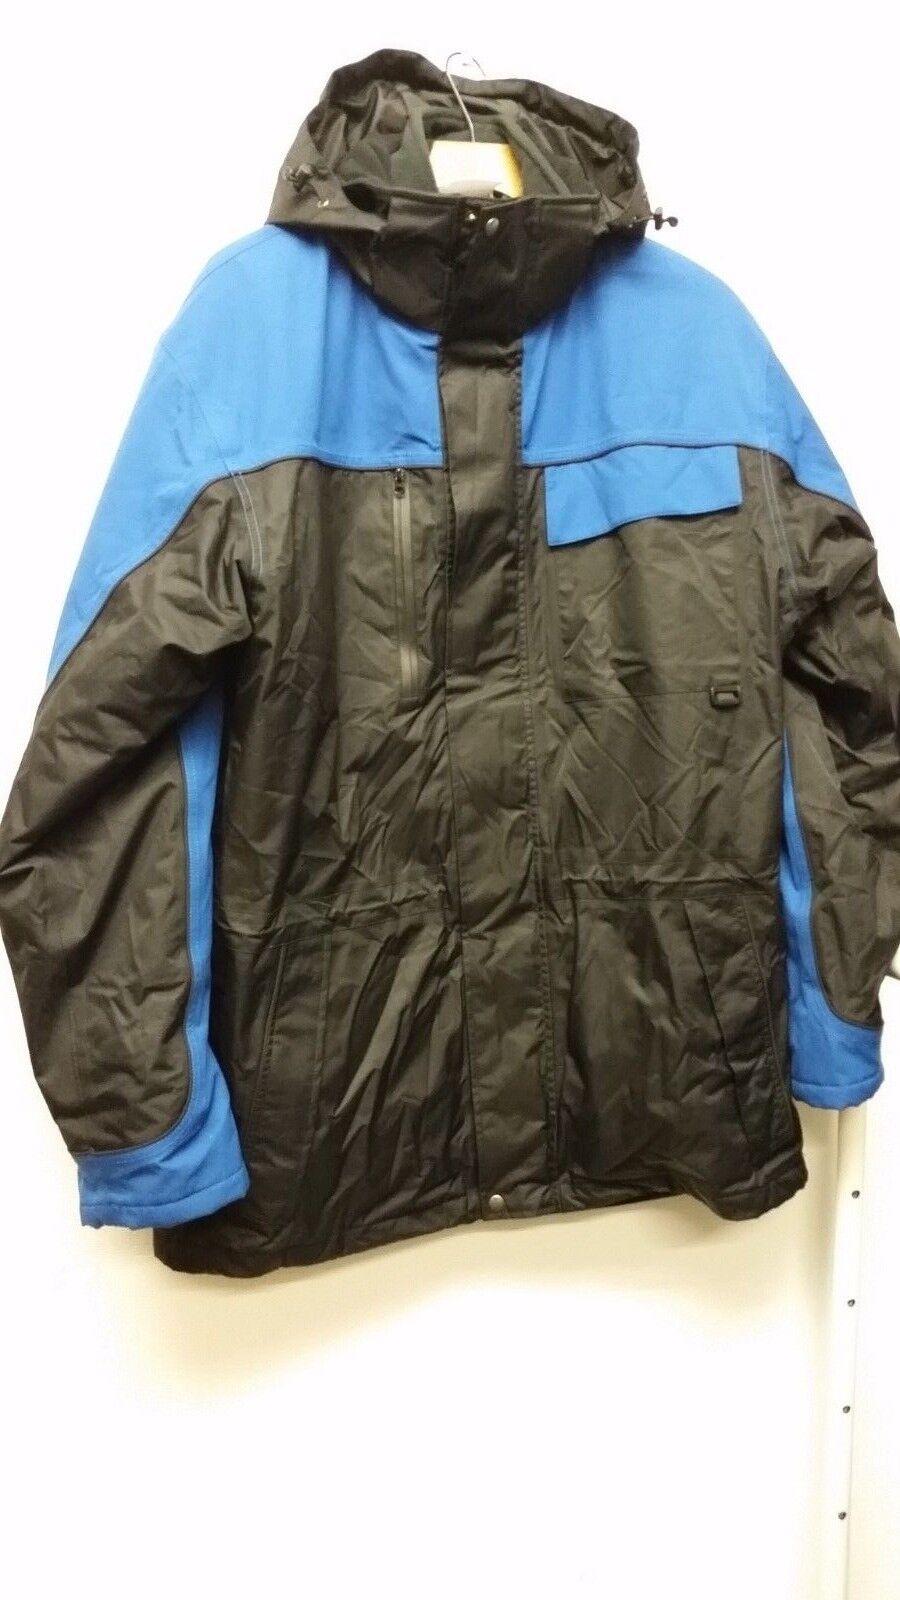 DIEM 2 in 1 Jacket Fishing Thermal Suit Waterproof Fleece Size M B442-10